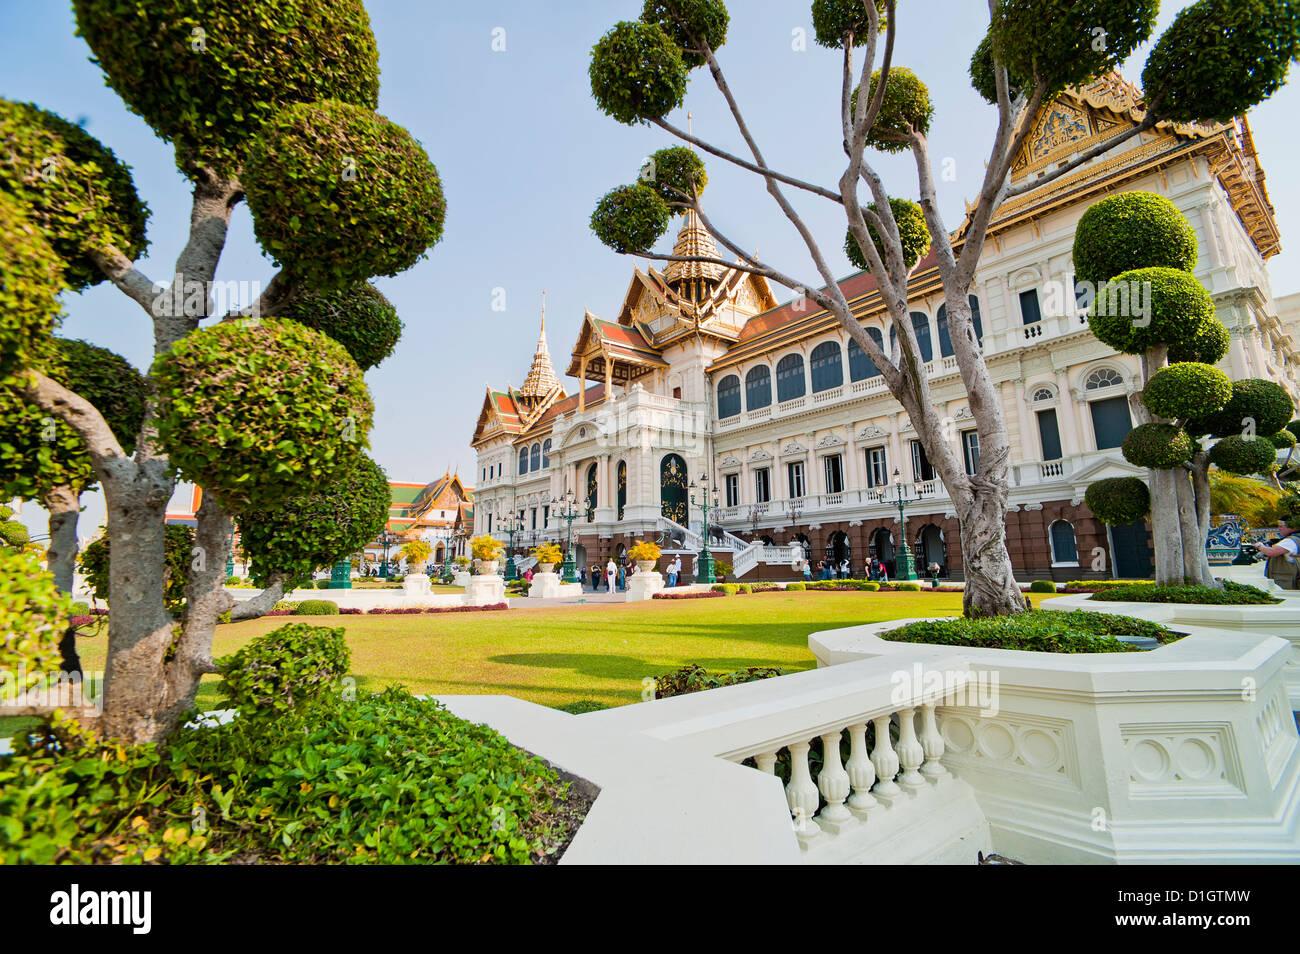 Chakri Maha Prasat Hall, Grand Palace, Bangkok, Thailand, Southeast Asia, Asia - Stock Image